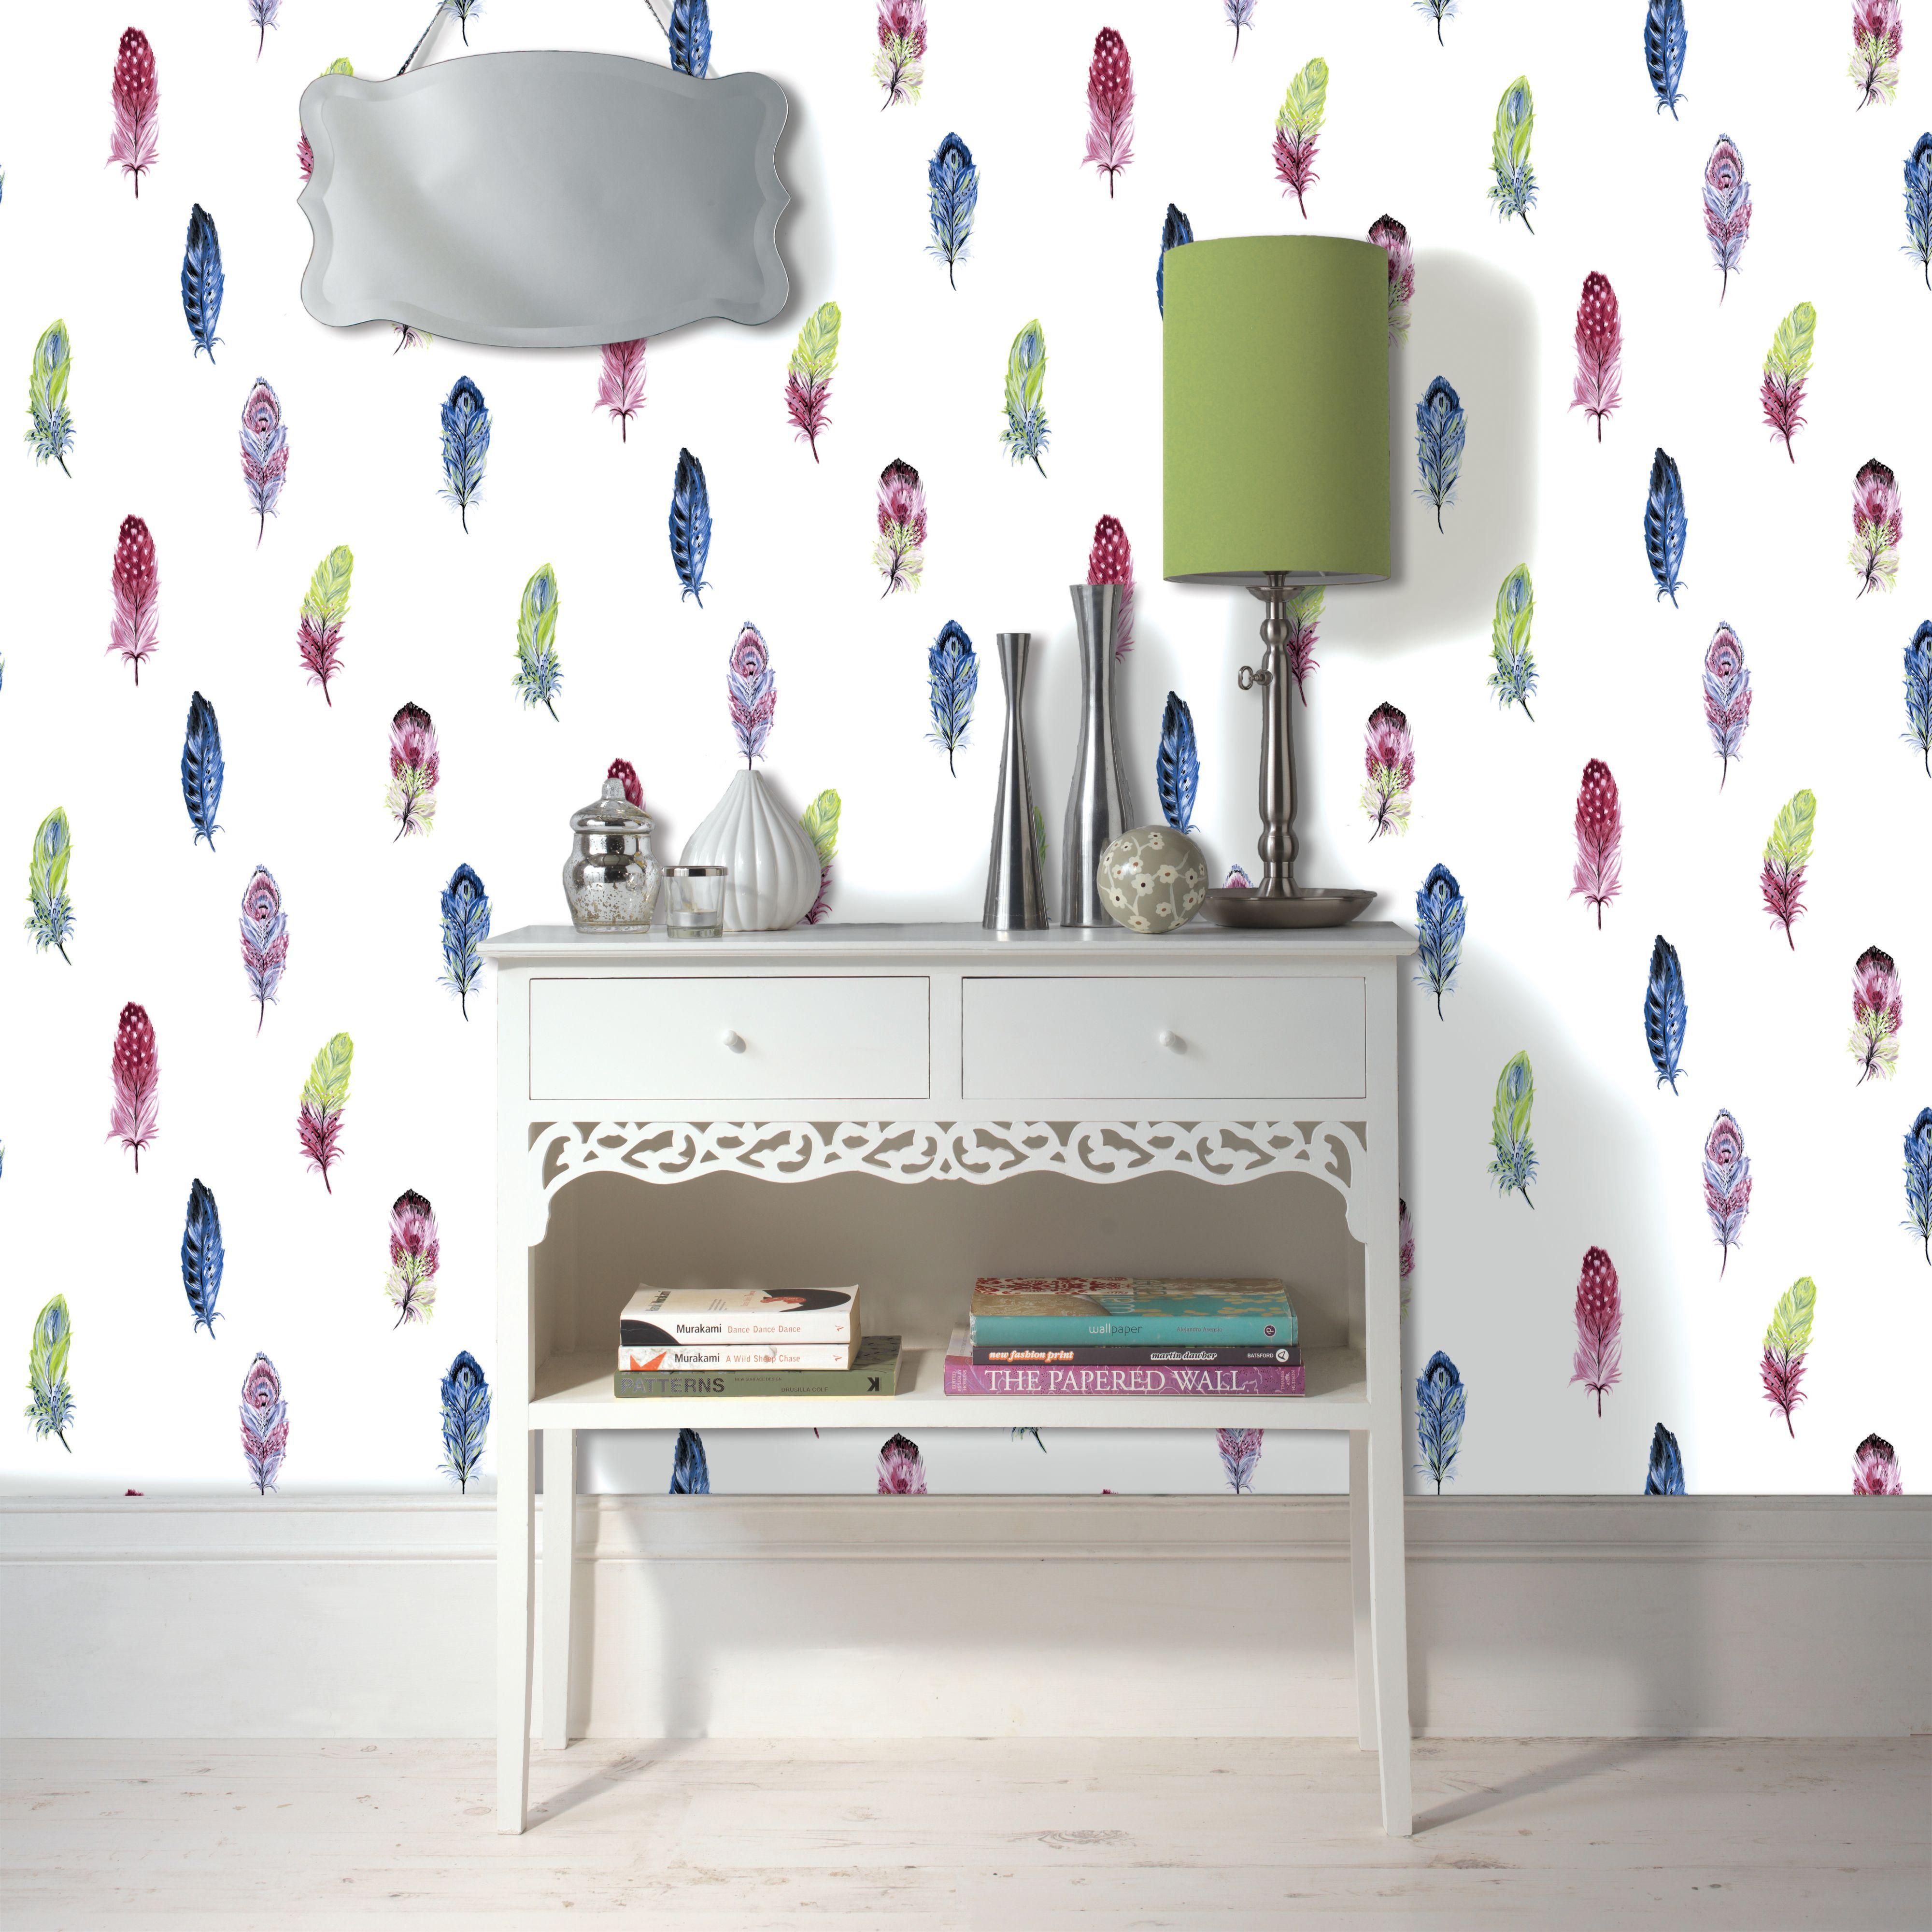 k2 feather wallpaper departments diy at b q. Black Bedroom Furniture Sets. Home Design Ideas